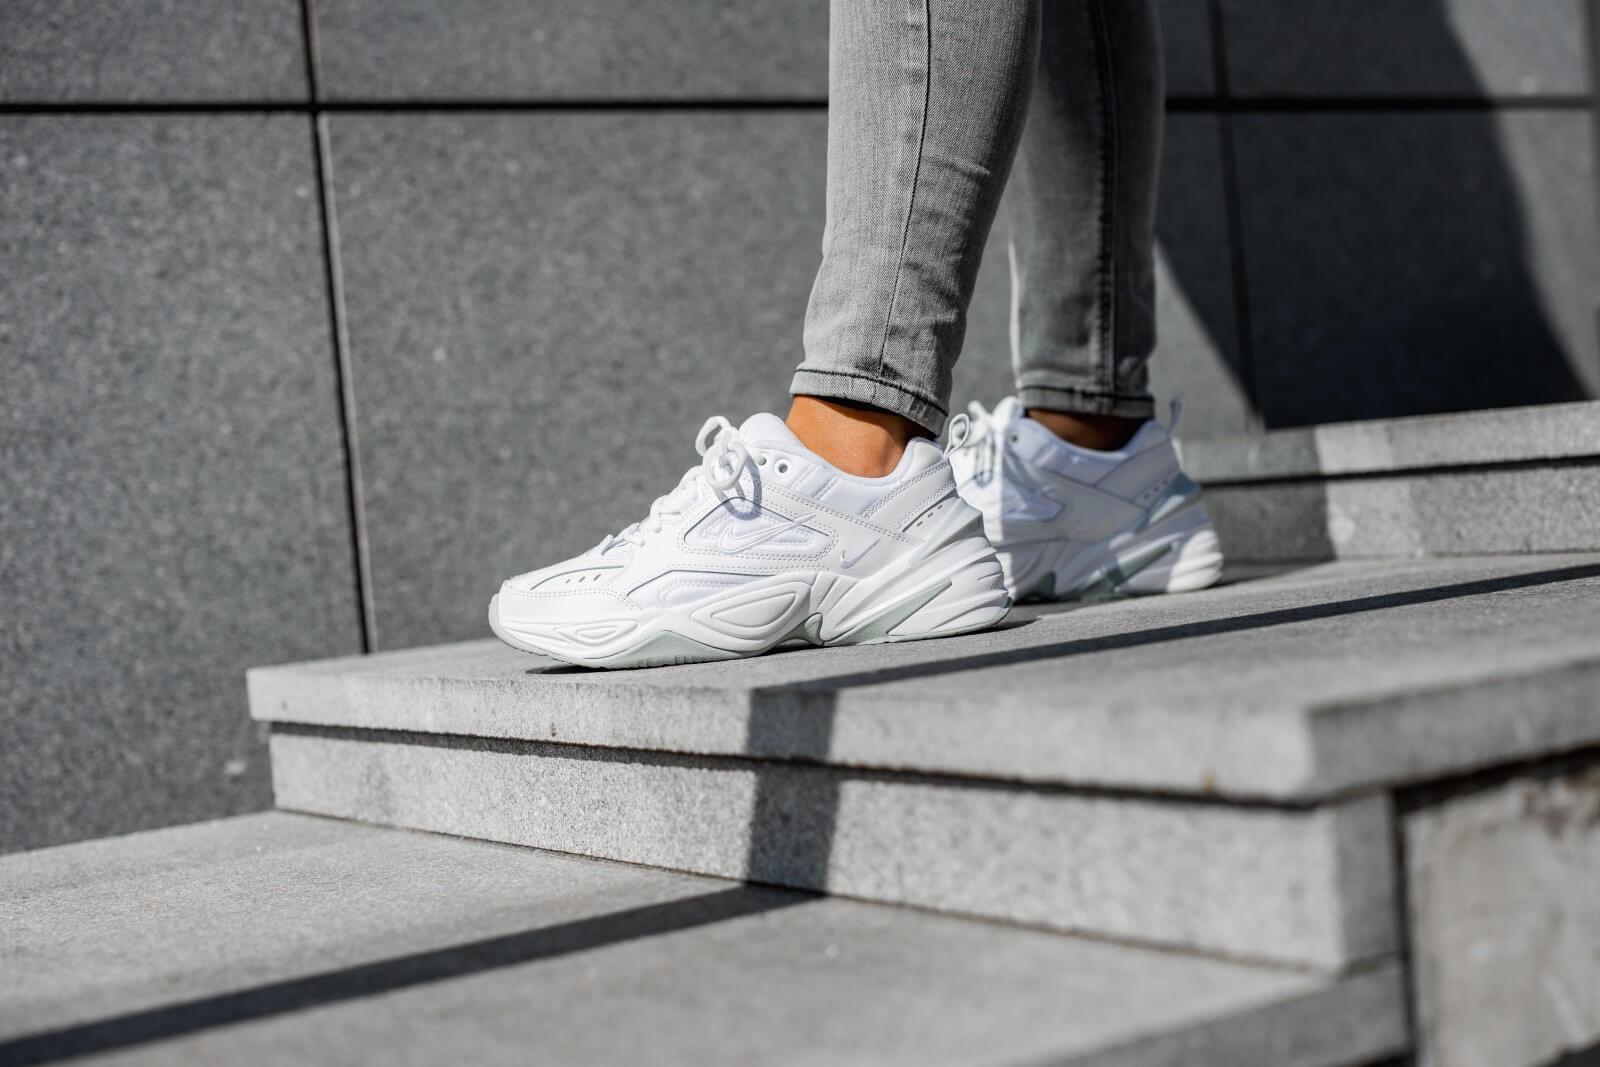 Nike Women's M2K Tekno White/Pure Platinum